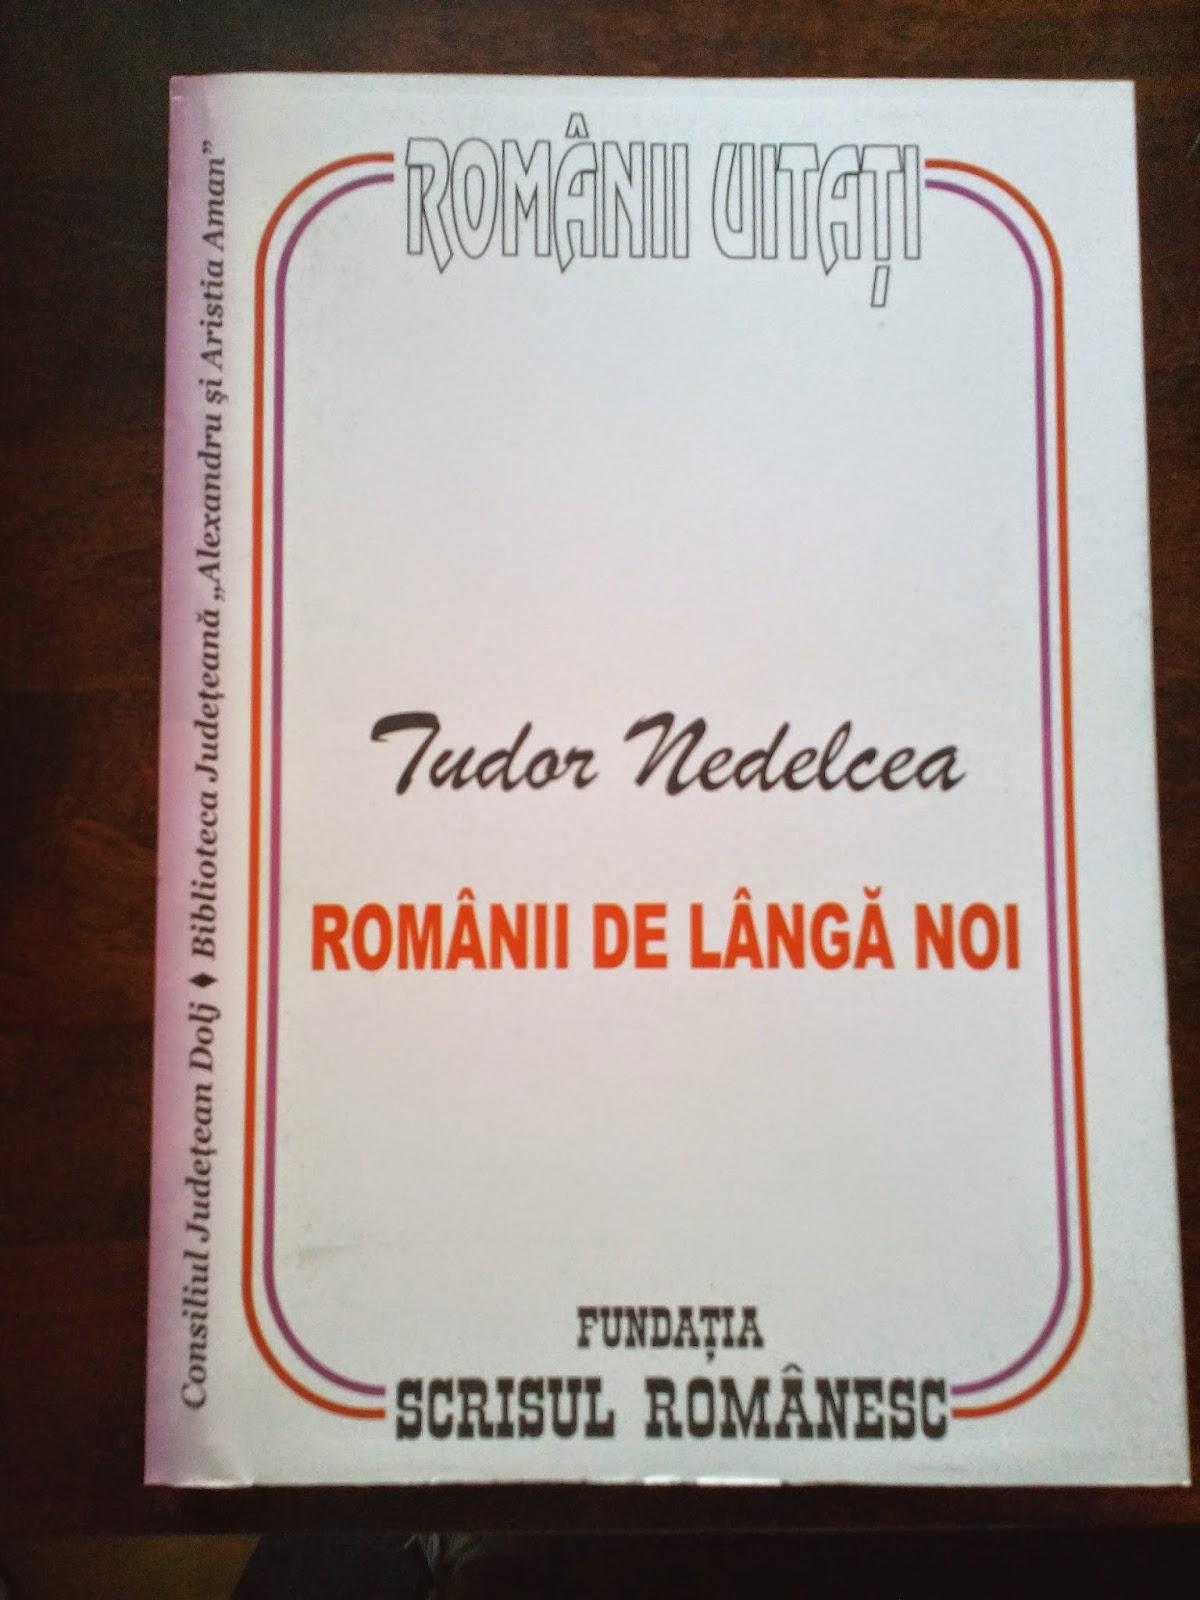 Tudor Nedelcea - Romanii de langa noi